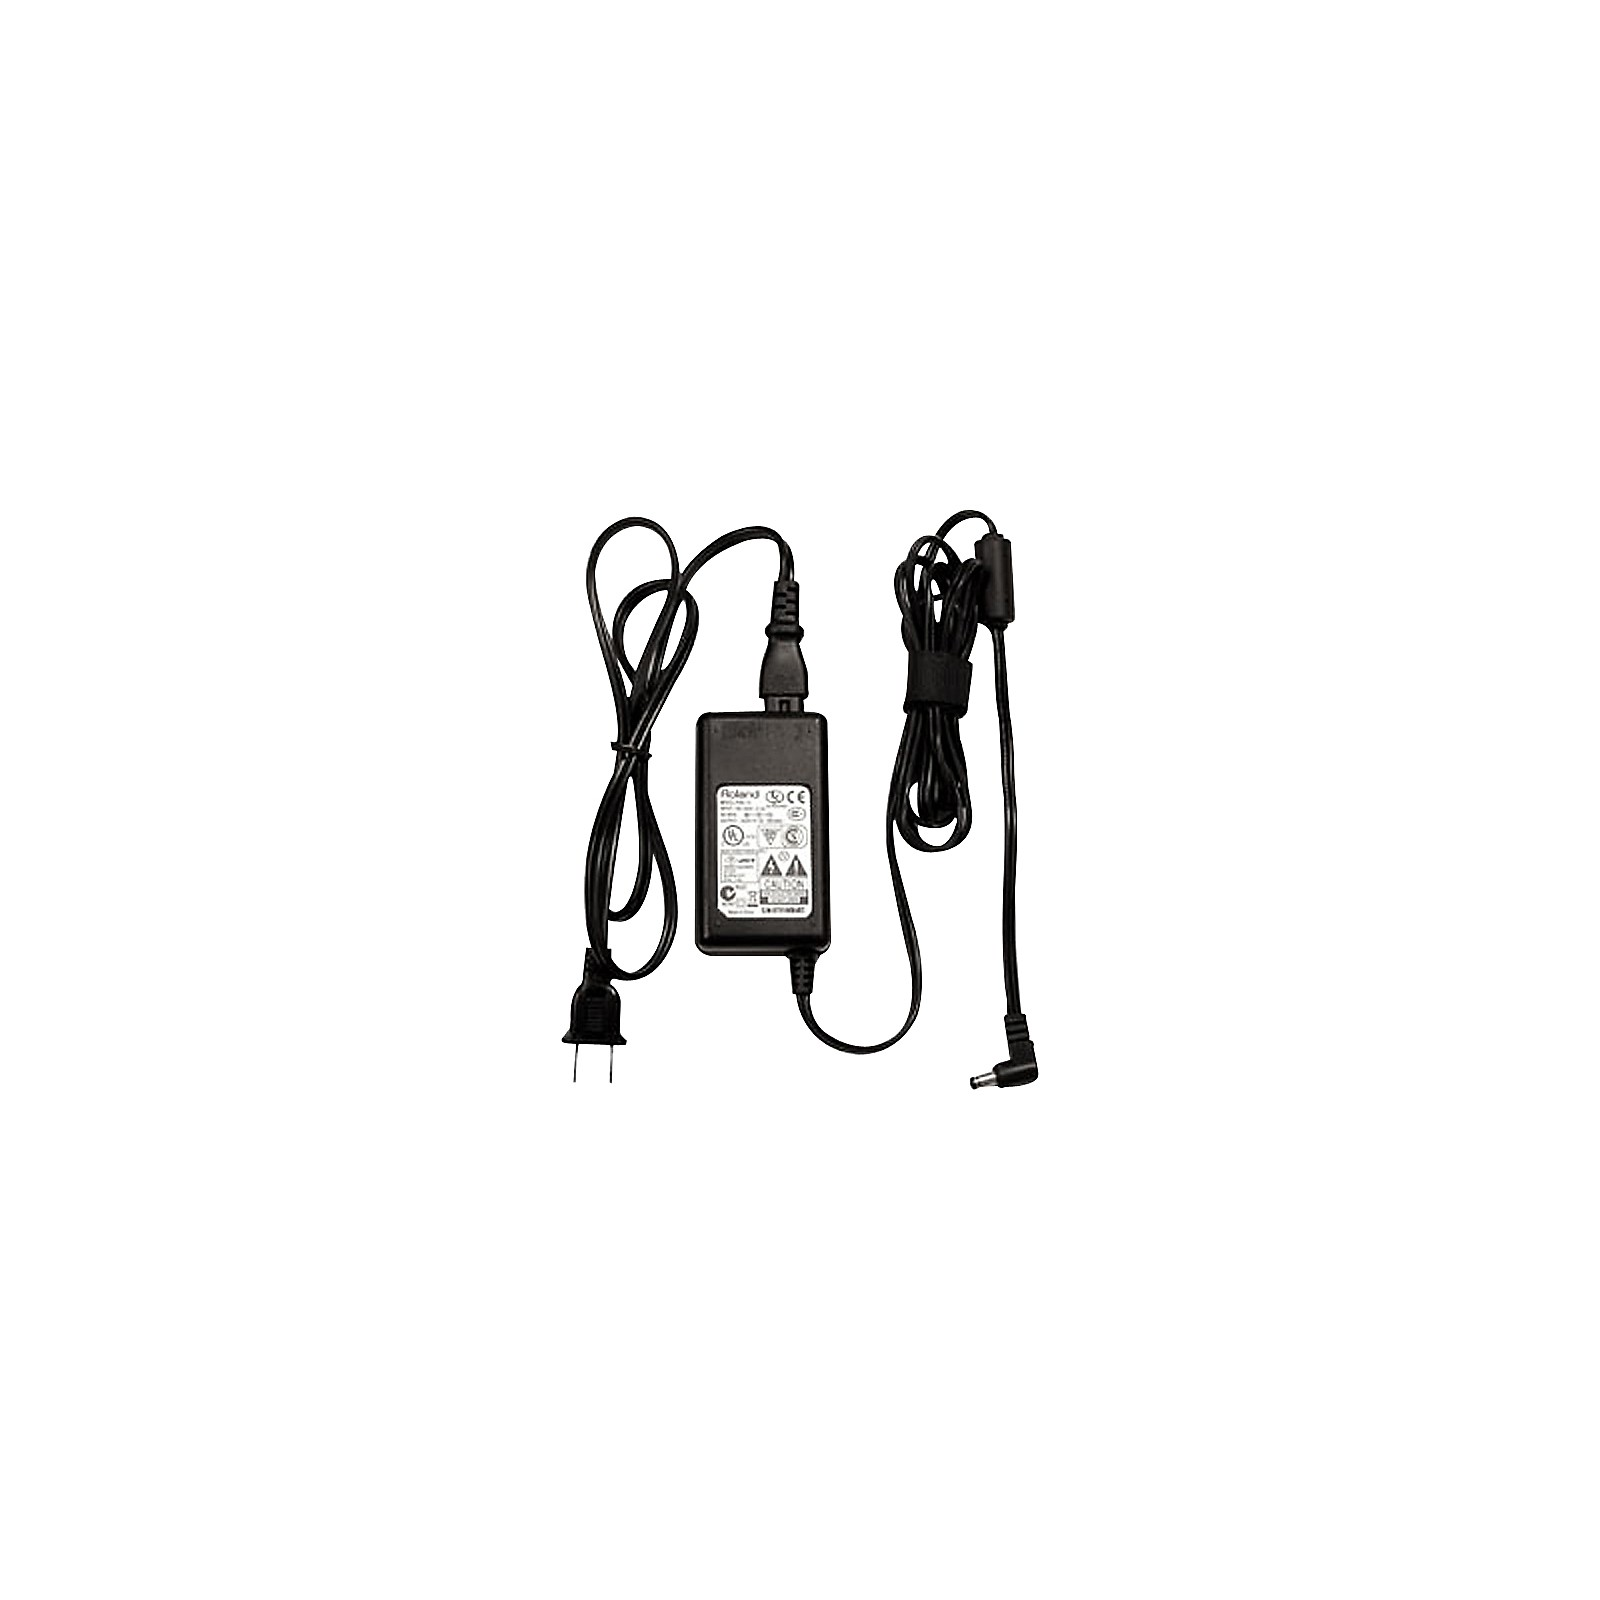 Roland PSB-120 Power Adapter